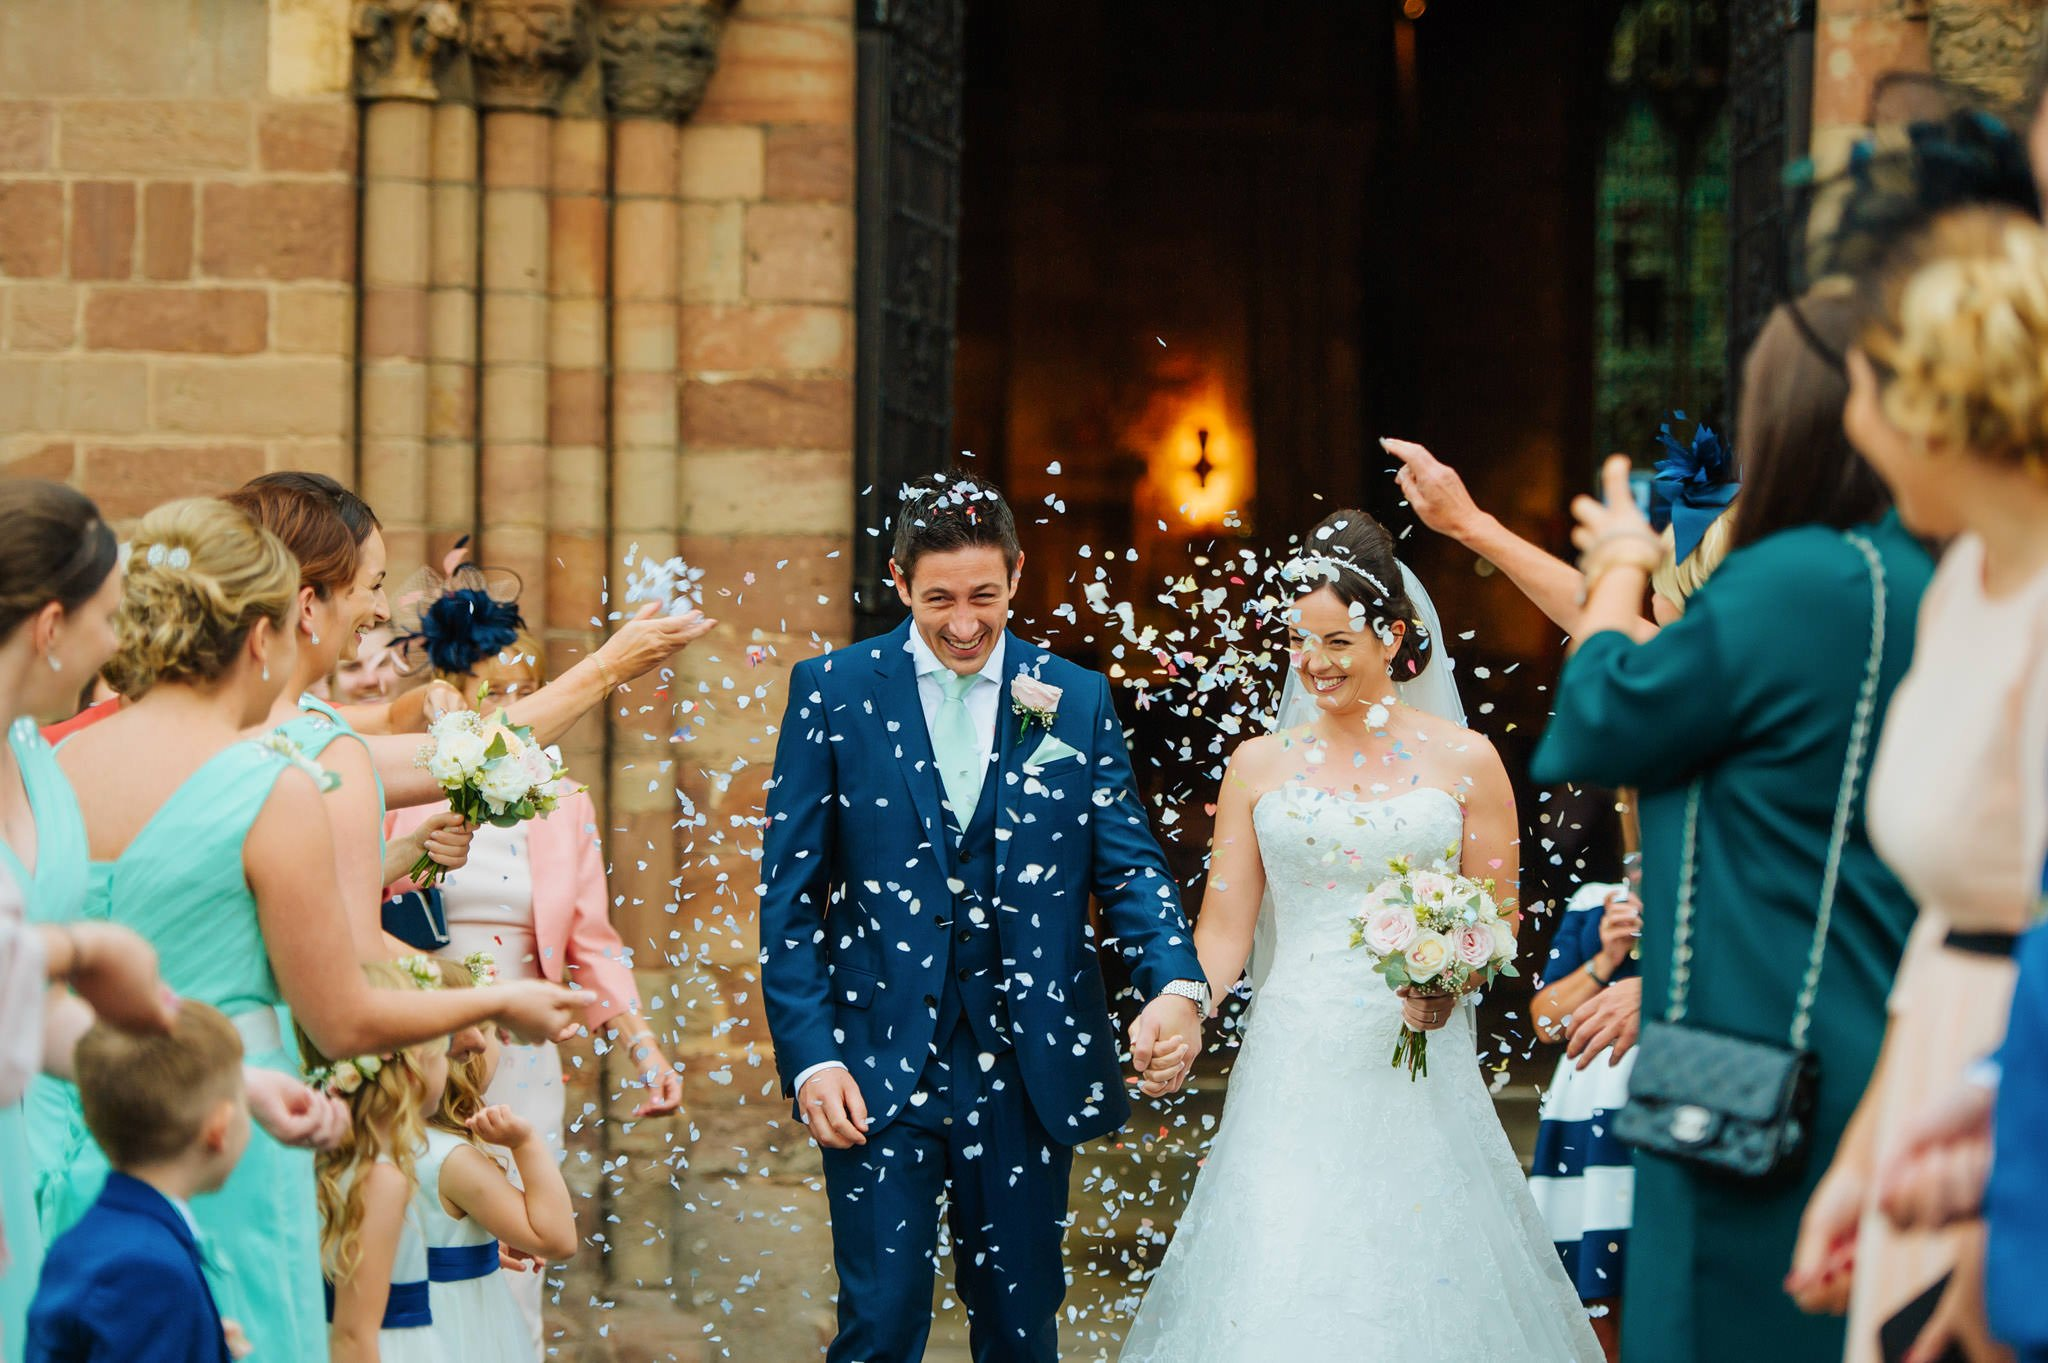 Eastnor Castle wedding photographer Herefordshire, West Midlands - Sarah + Dean 32